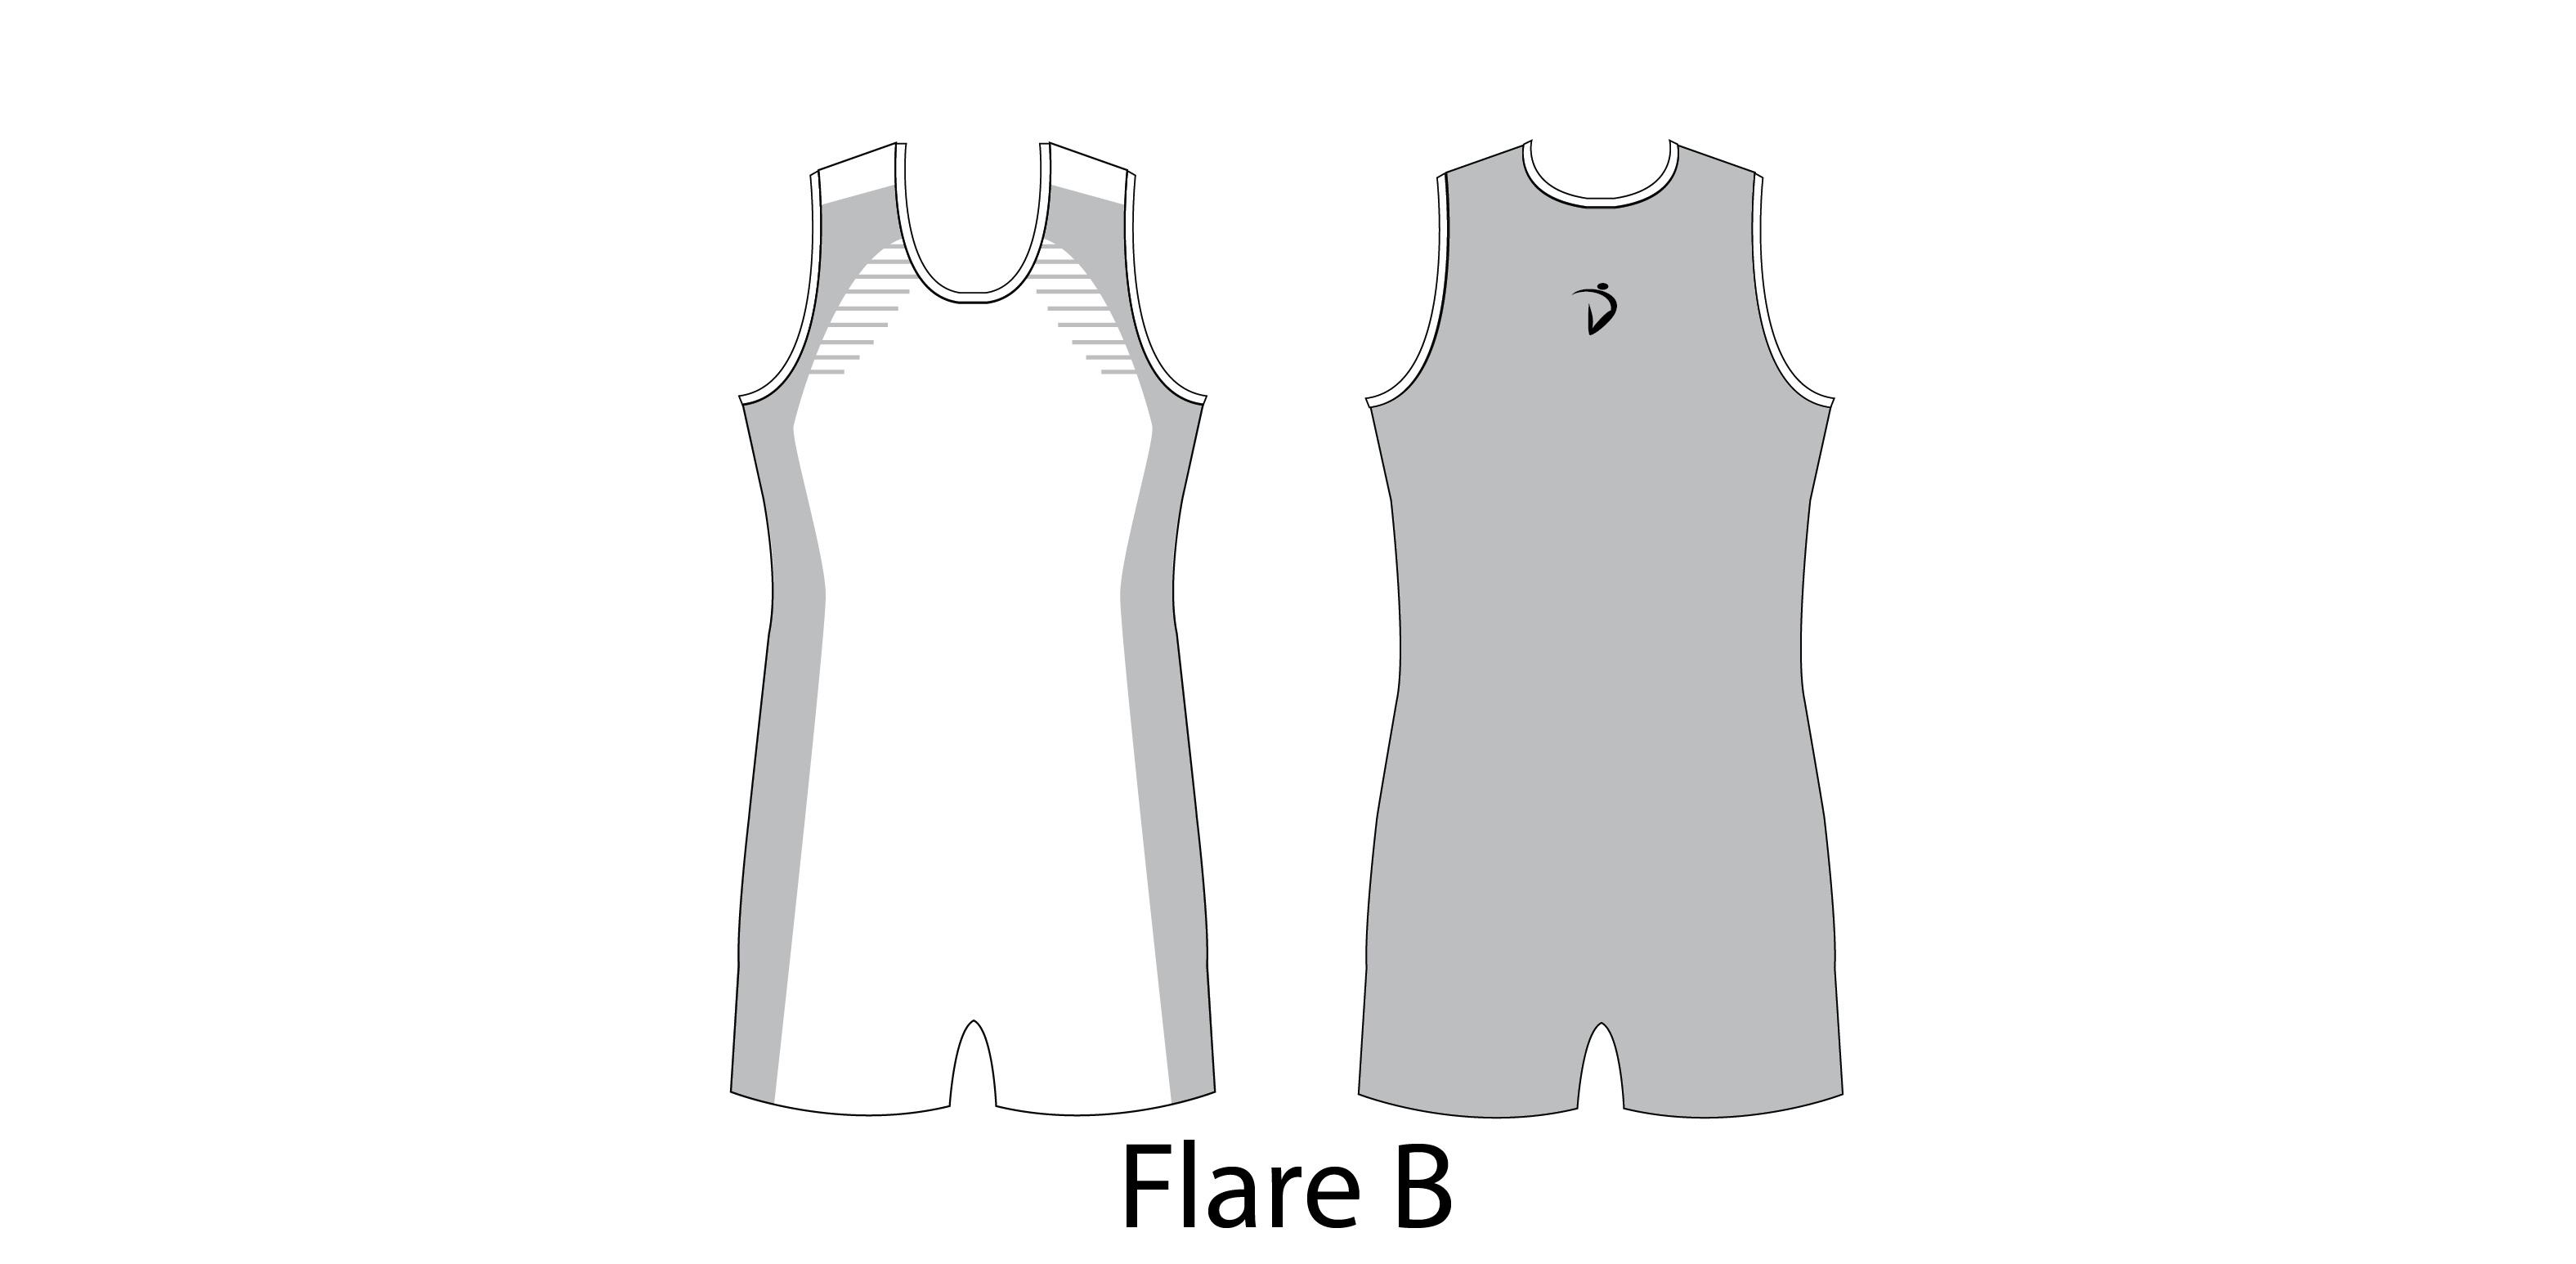 Flare B